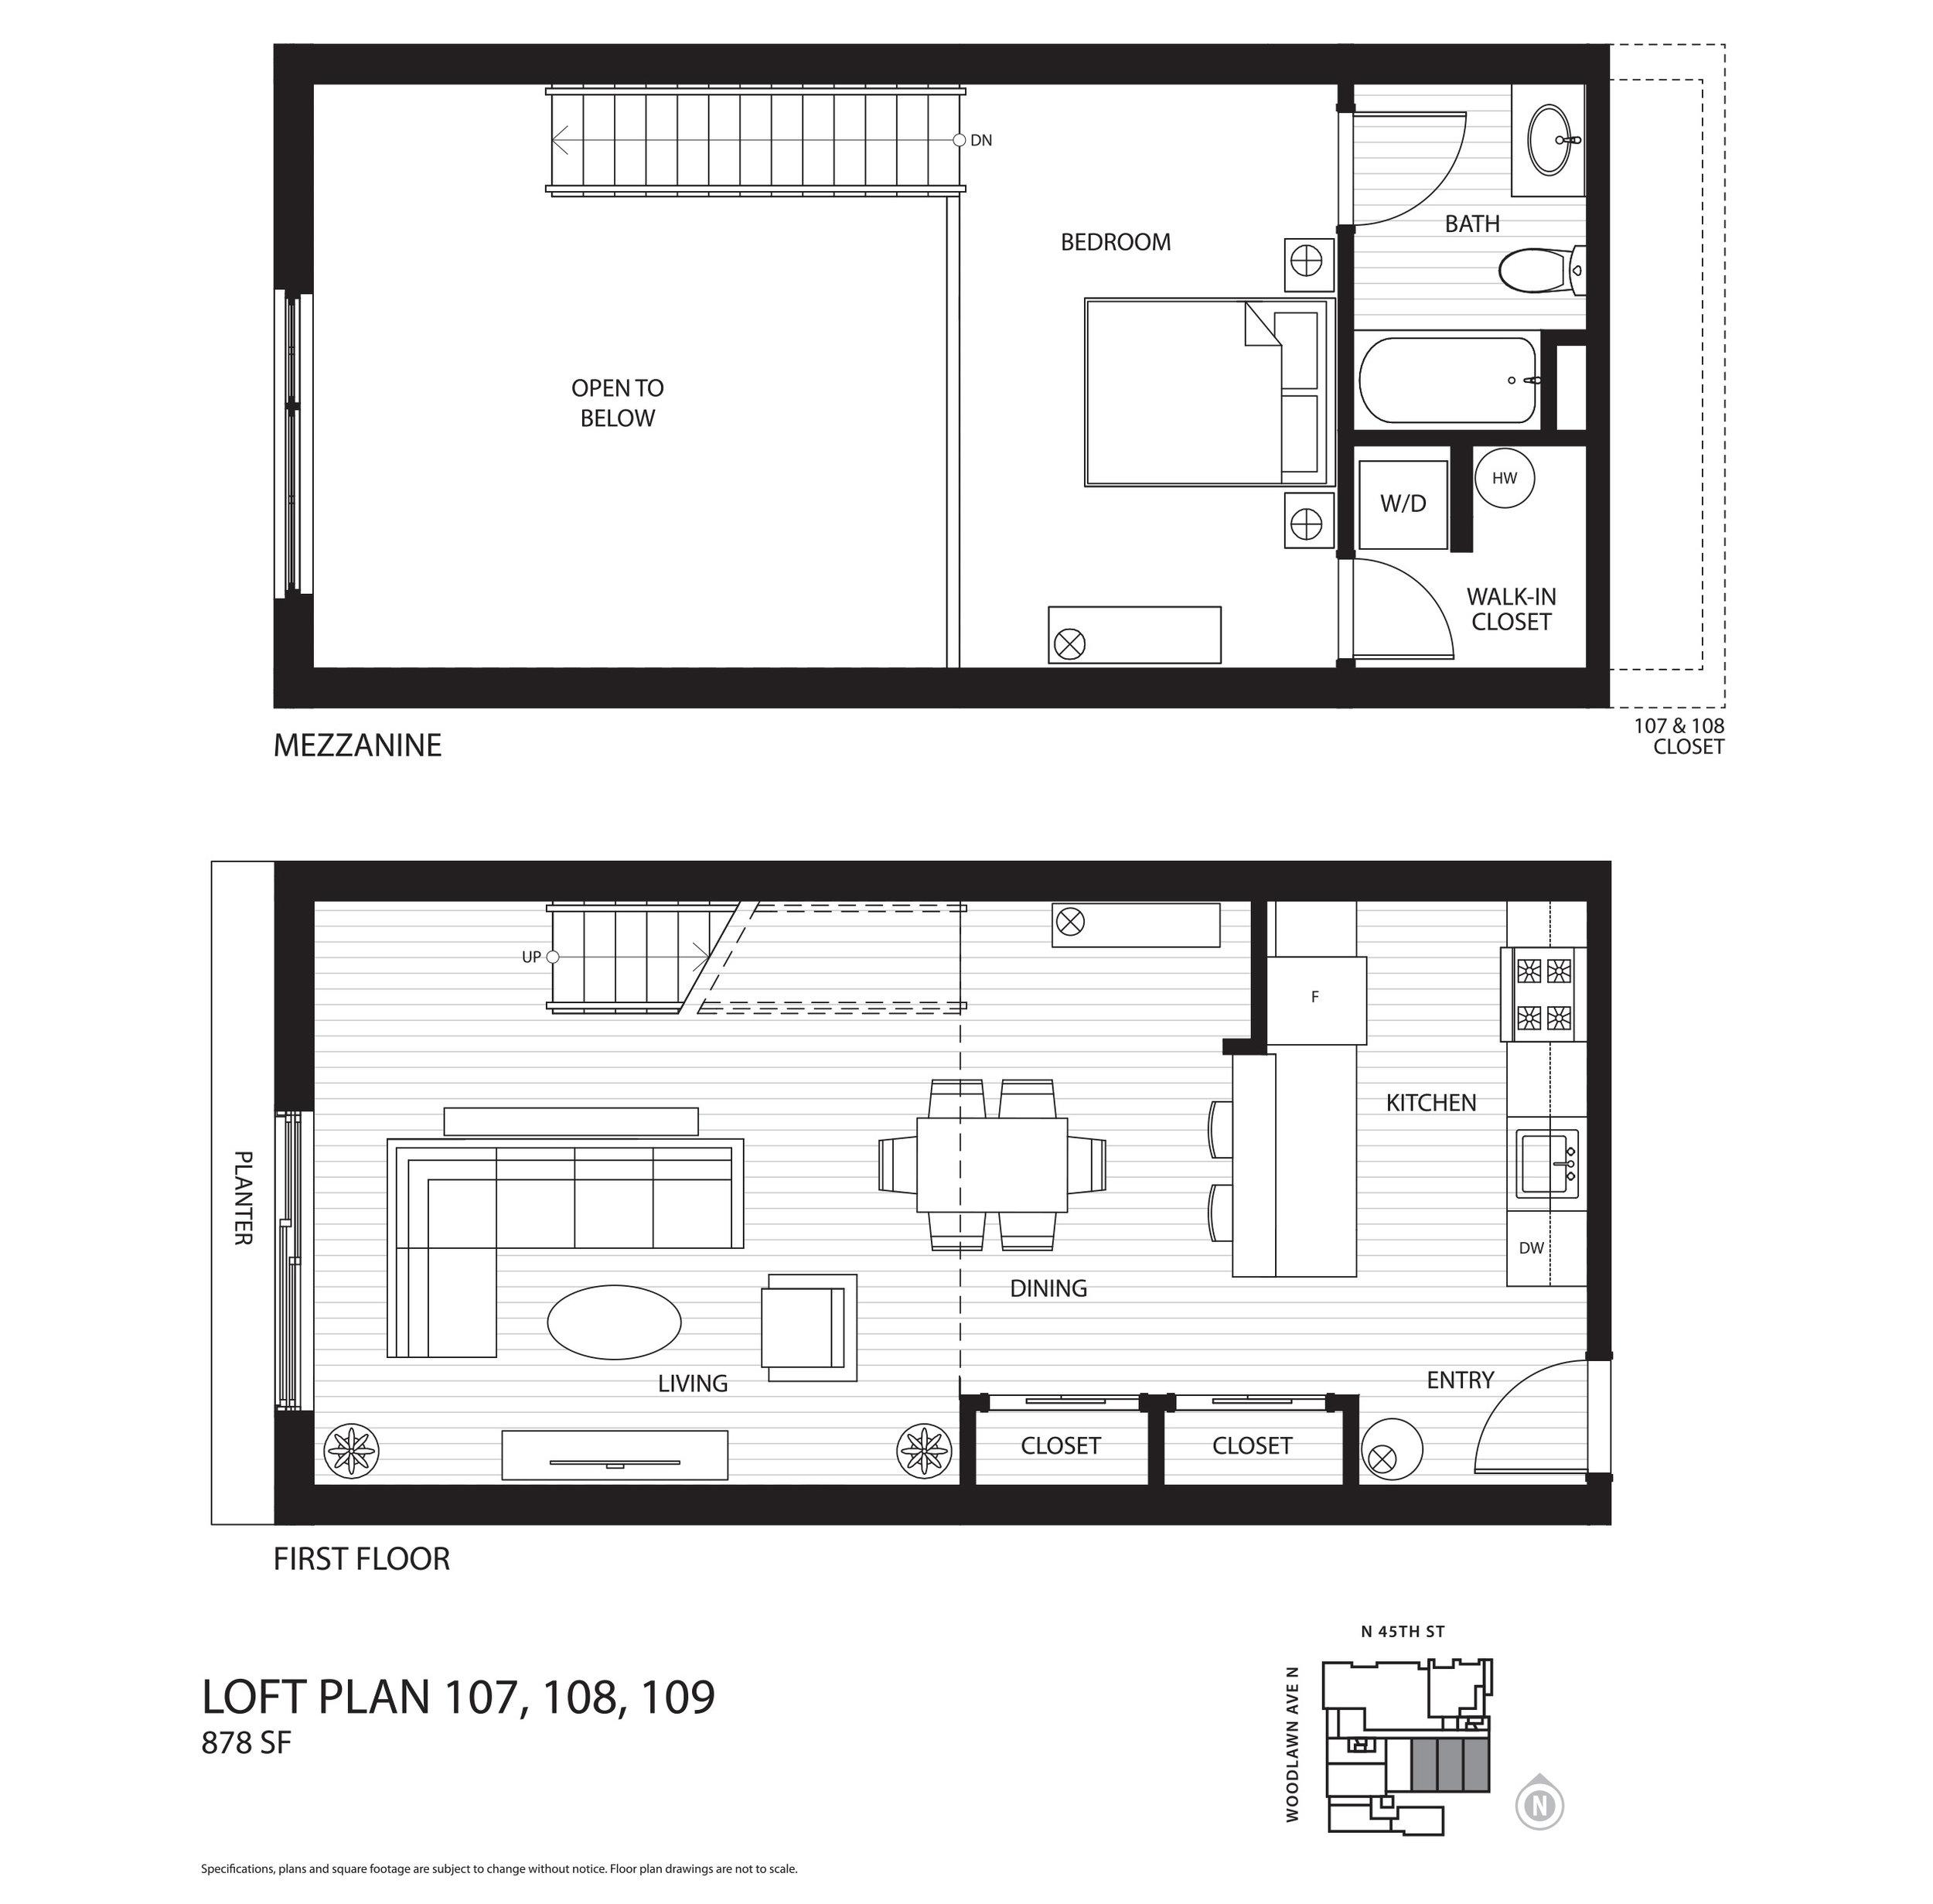 Loft-107.jpg